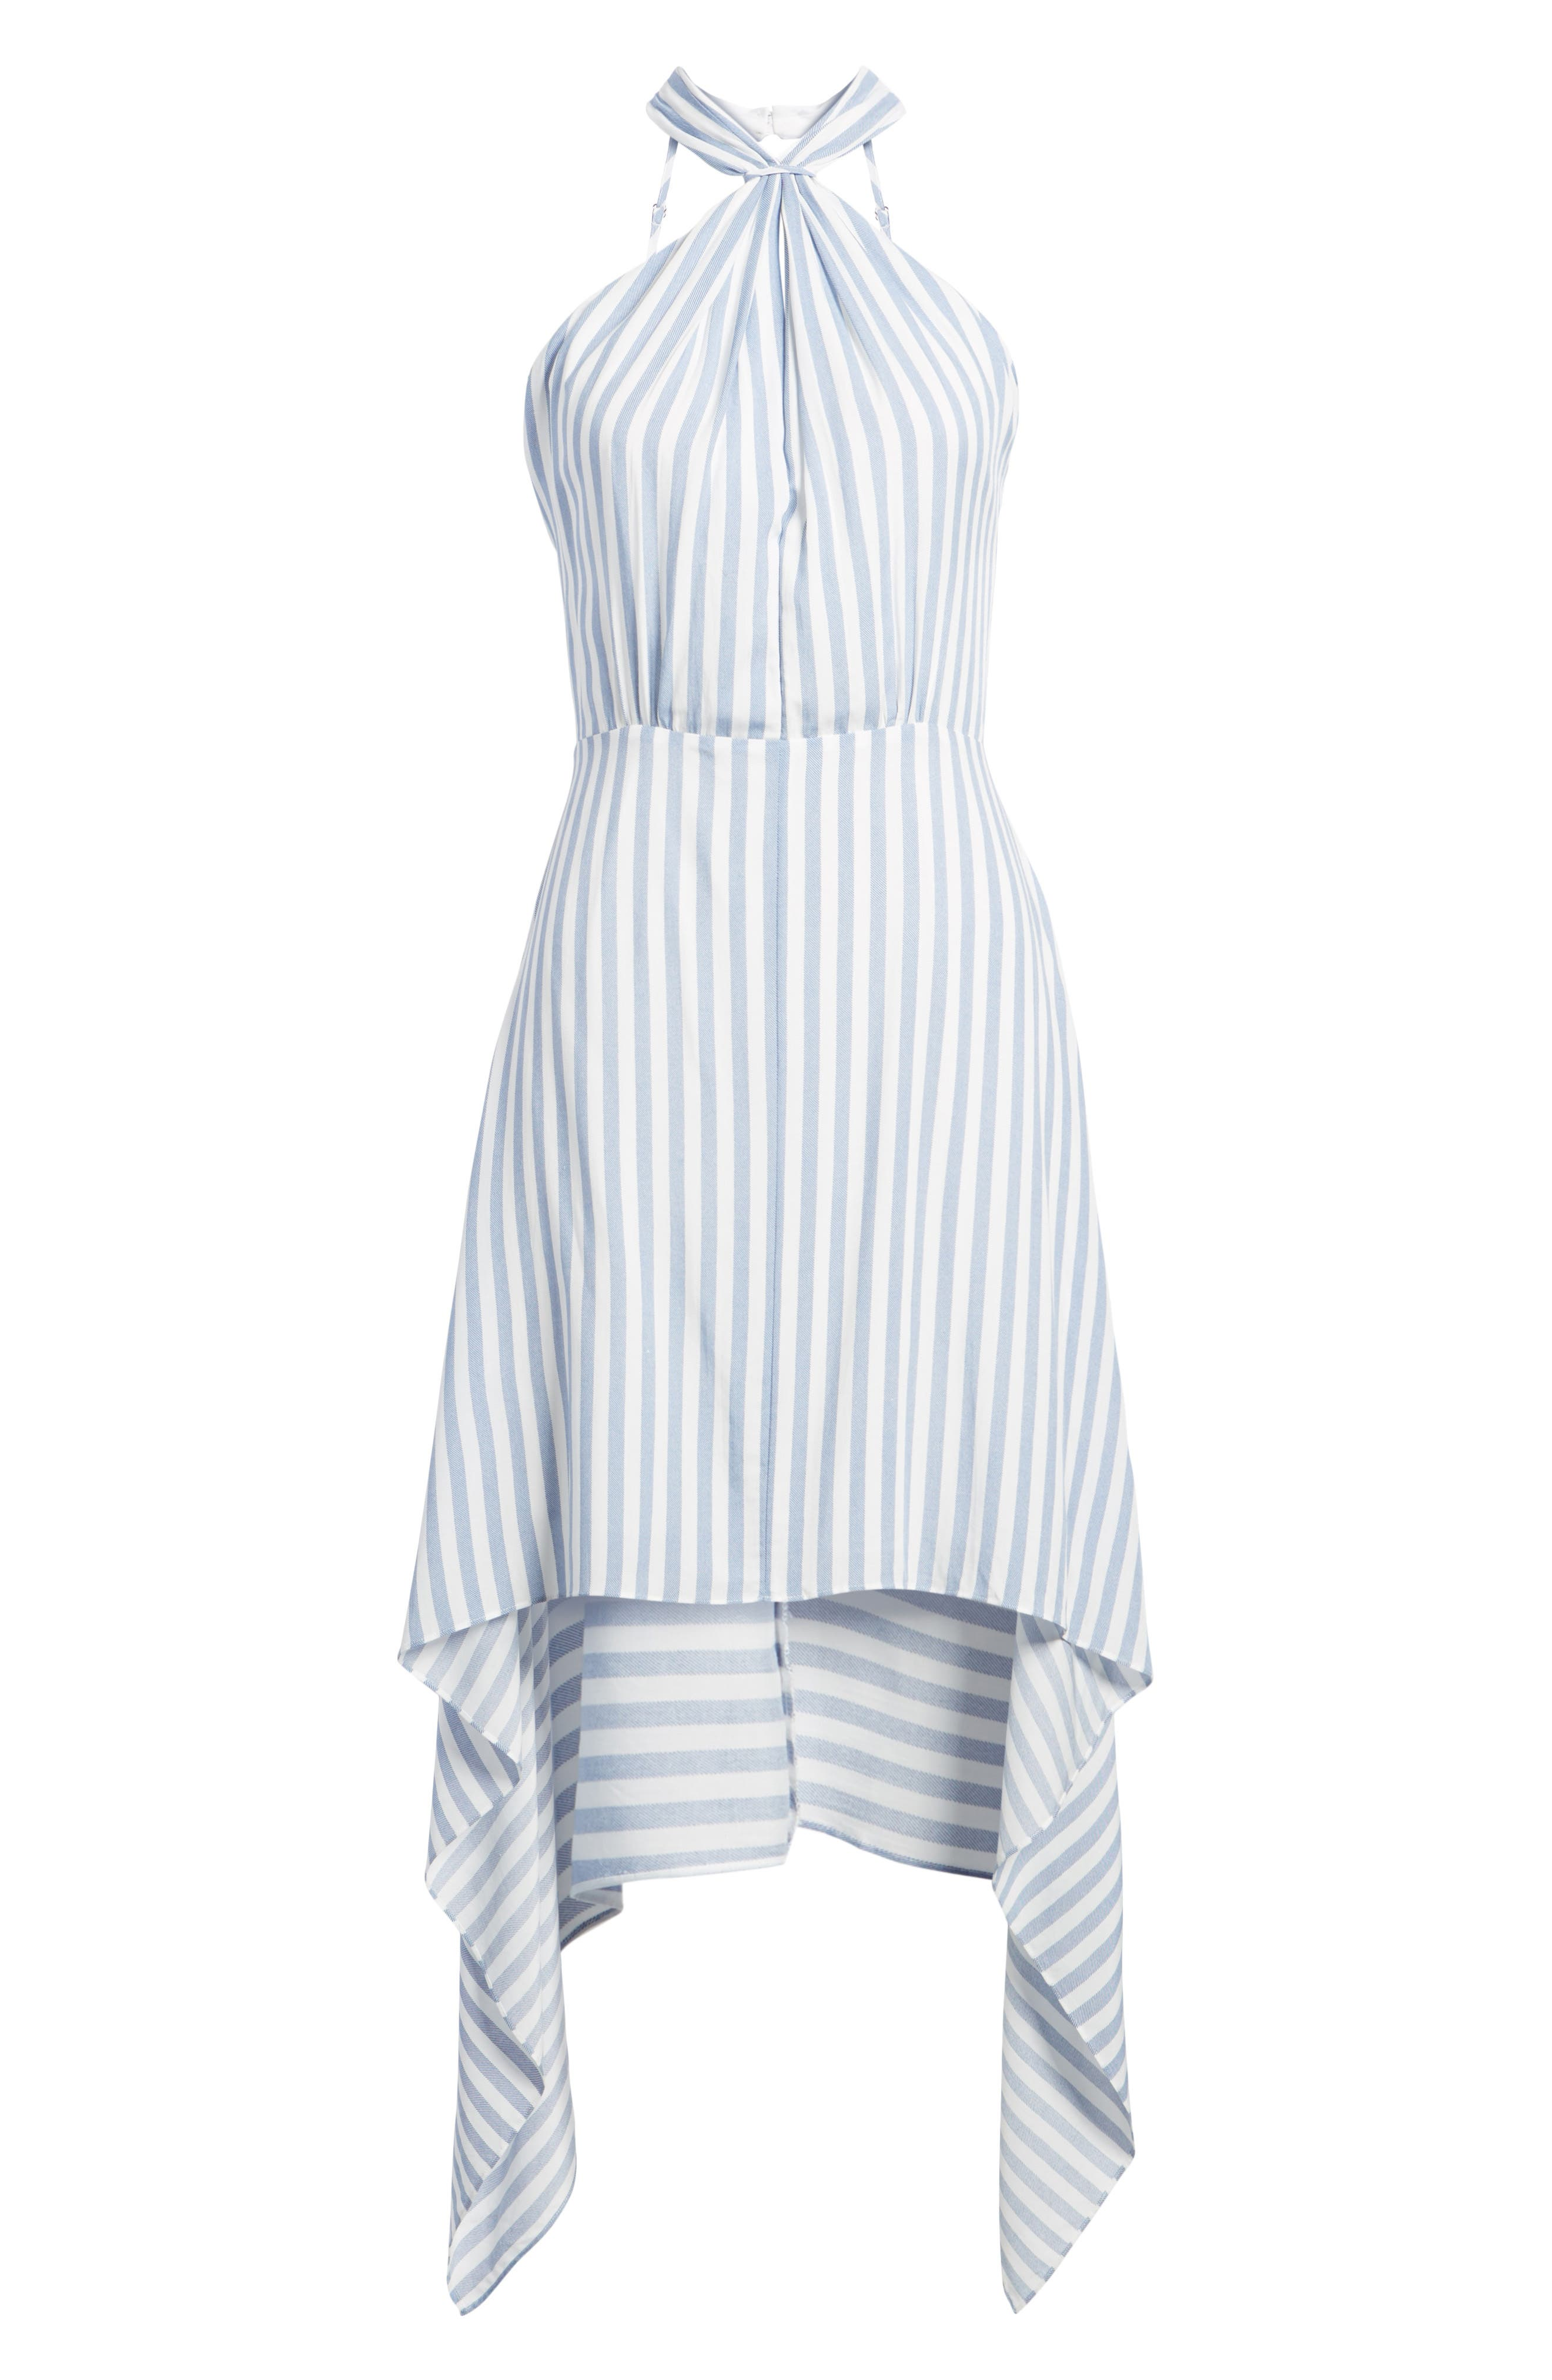 Bishop + Young Ana Stripe Shark Bite Hem Halter Dress,                             Alternate thumbnail 7, color,                             Blue White Stripe